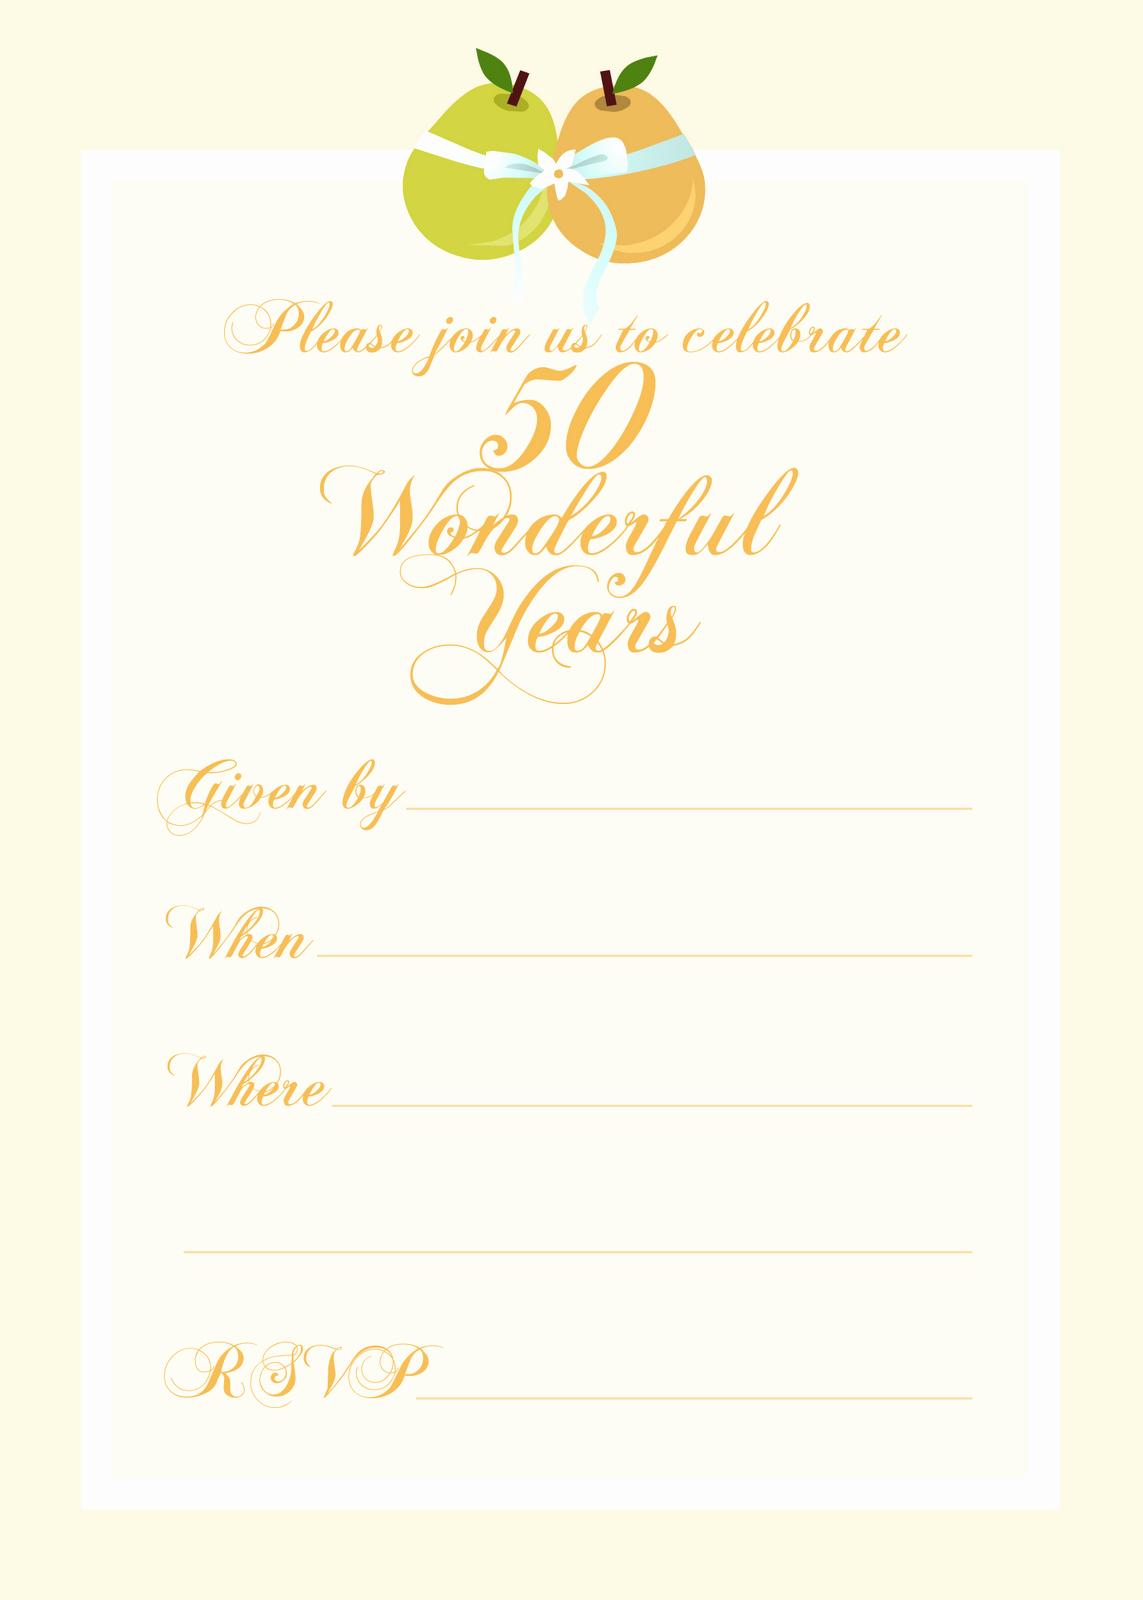 Wedding Anniversary Invitation Templates Unique Free Printable Party Invitations Free 50th Wedding